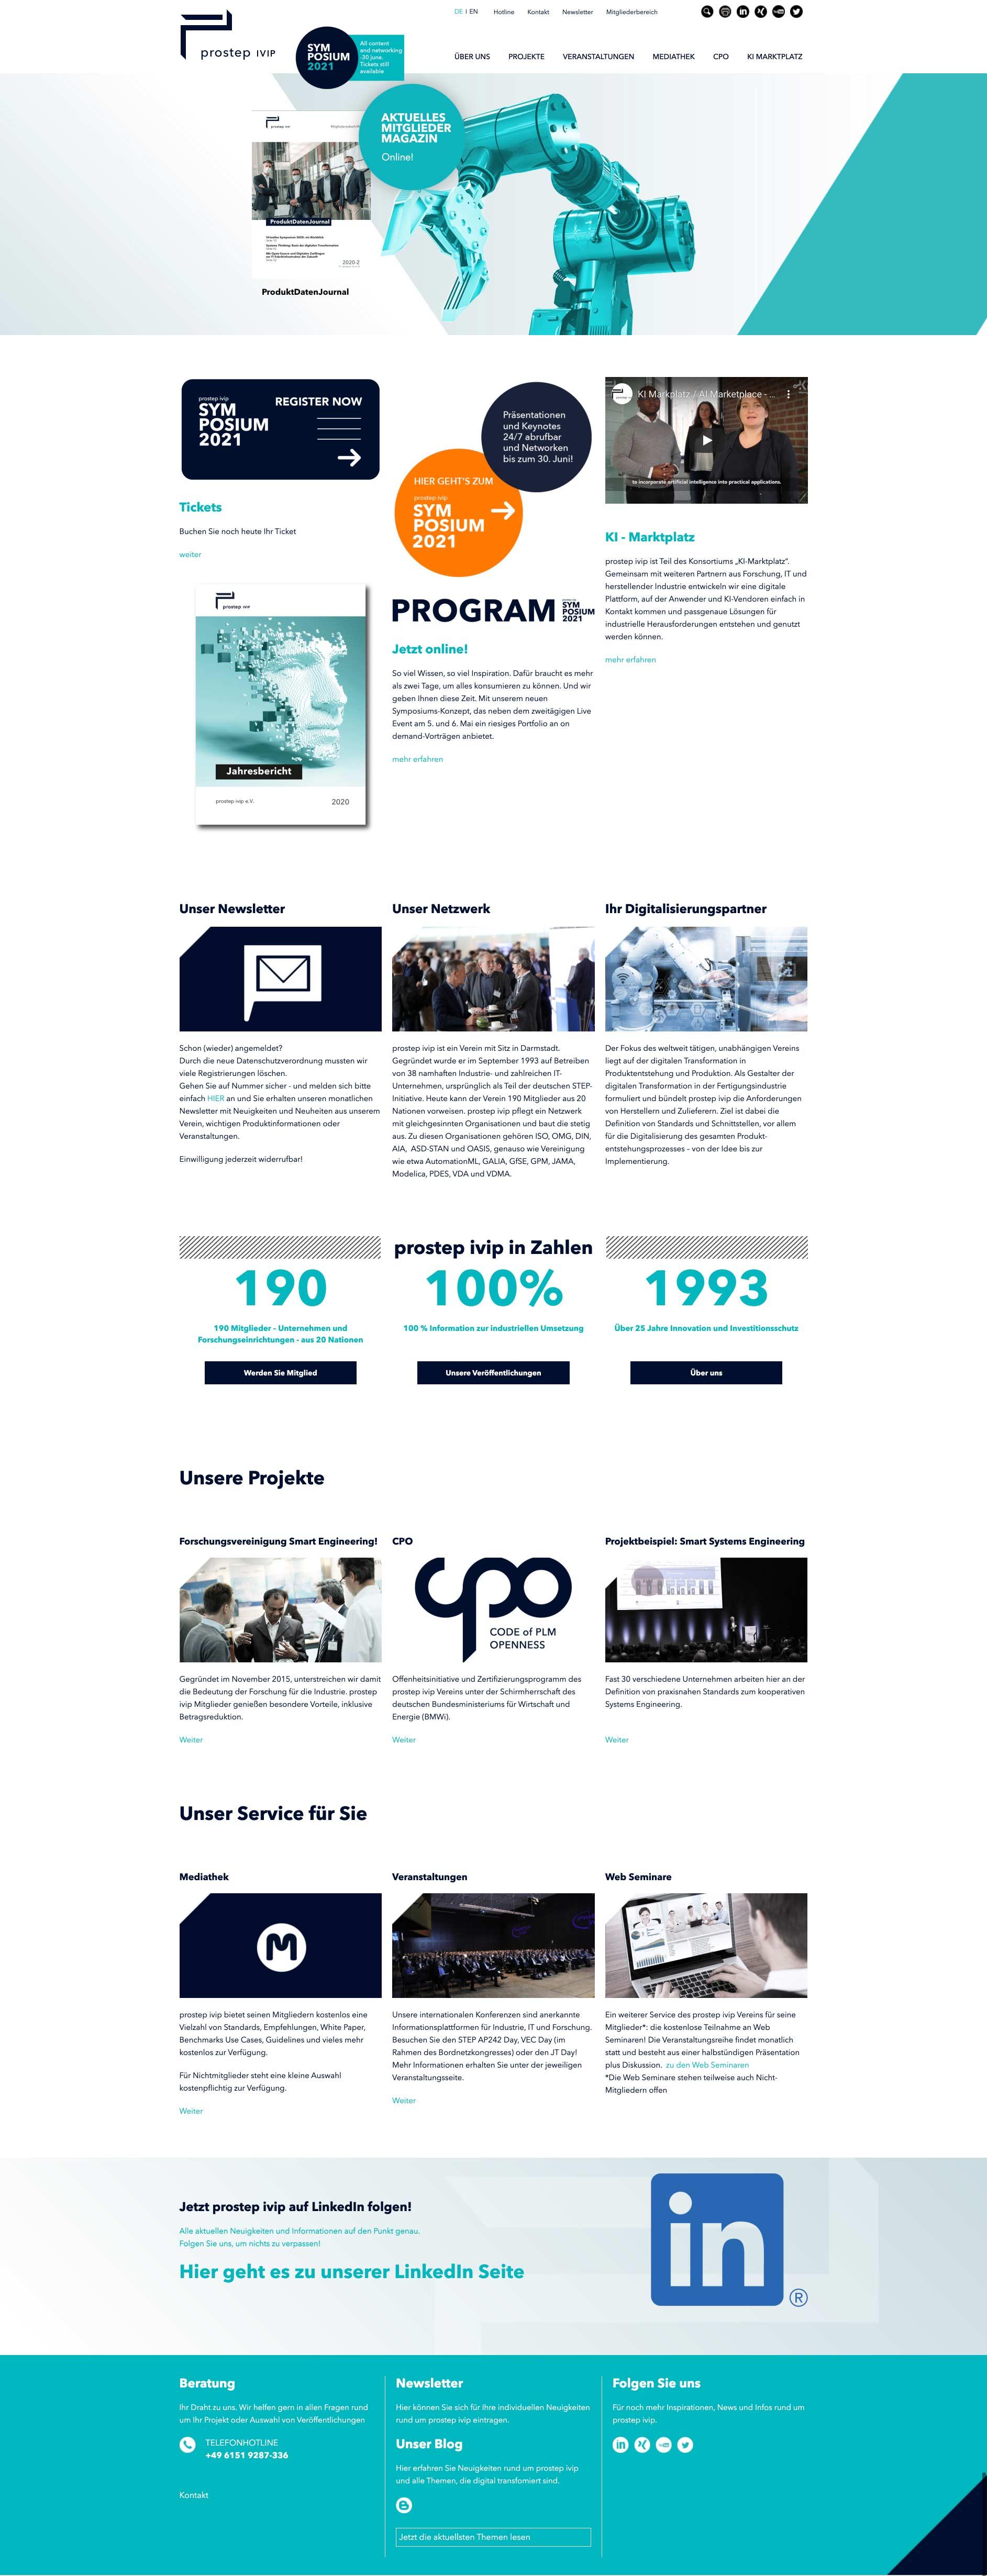 UI-Design, Webdesign, Screendesign Corporate Website von prostep ivip